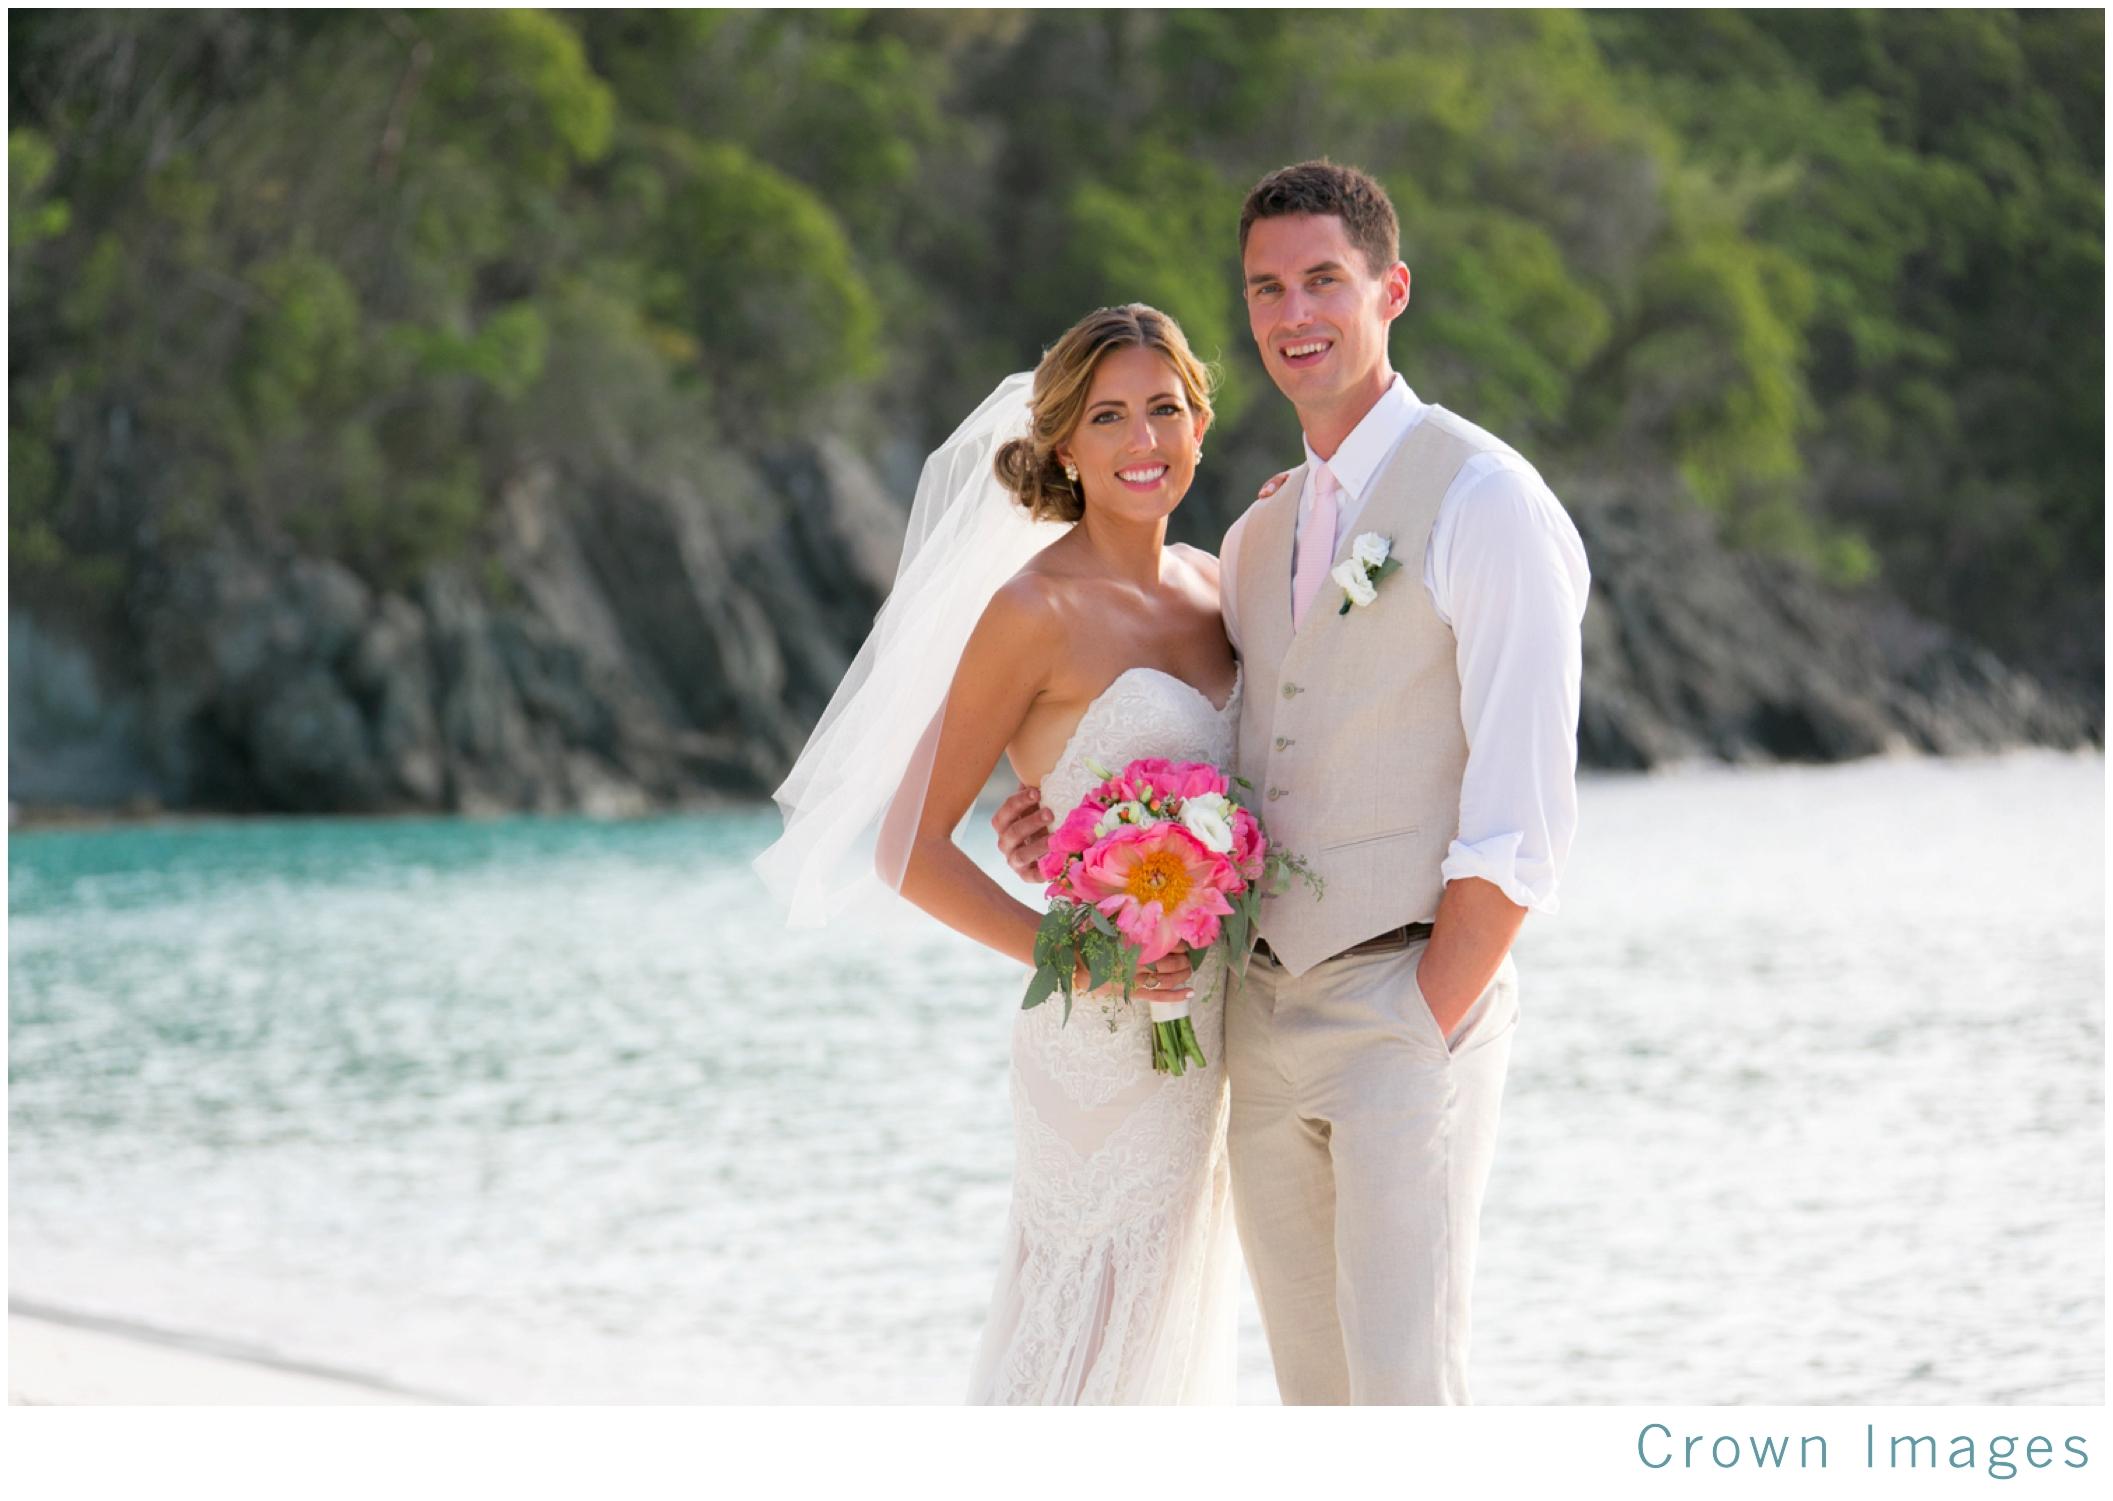 wedding photos crown images_1670.jpg